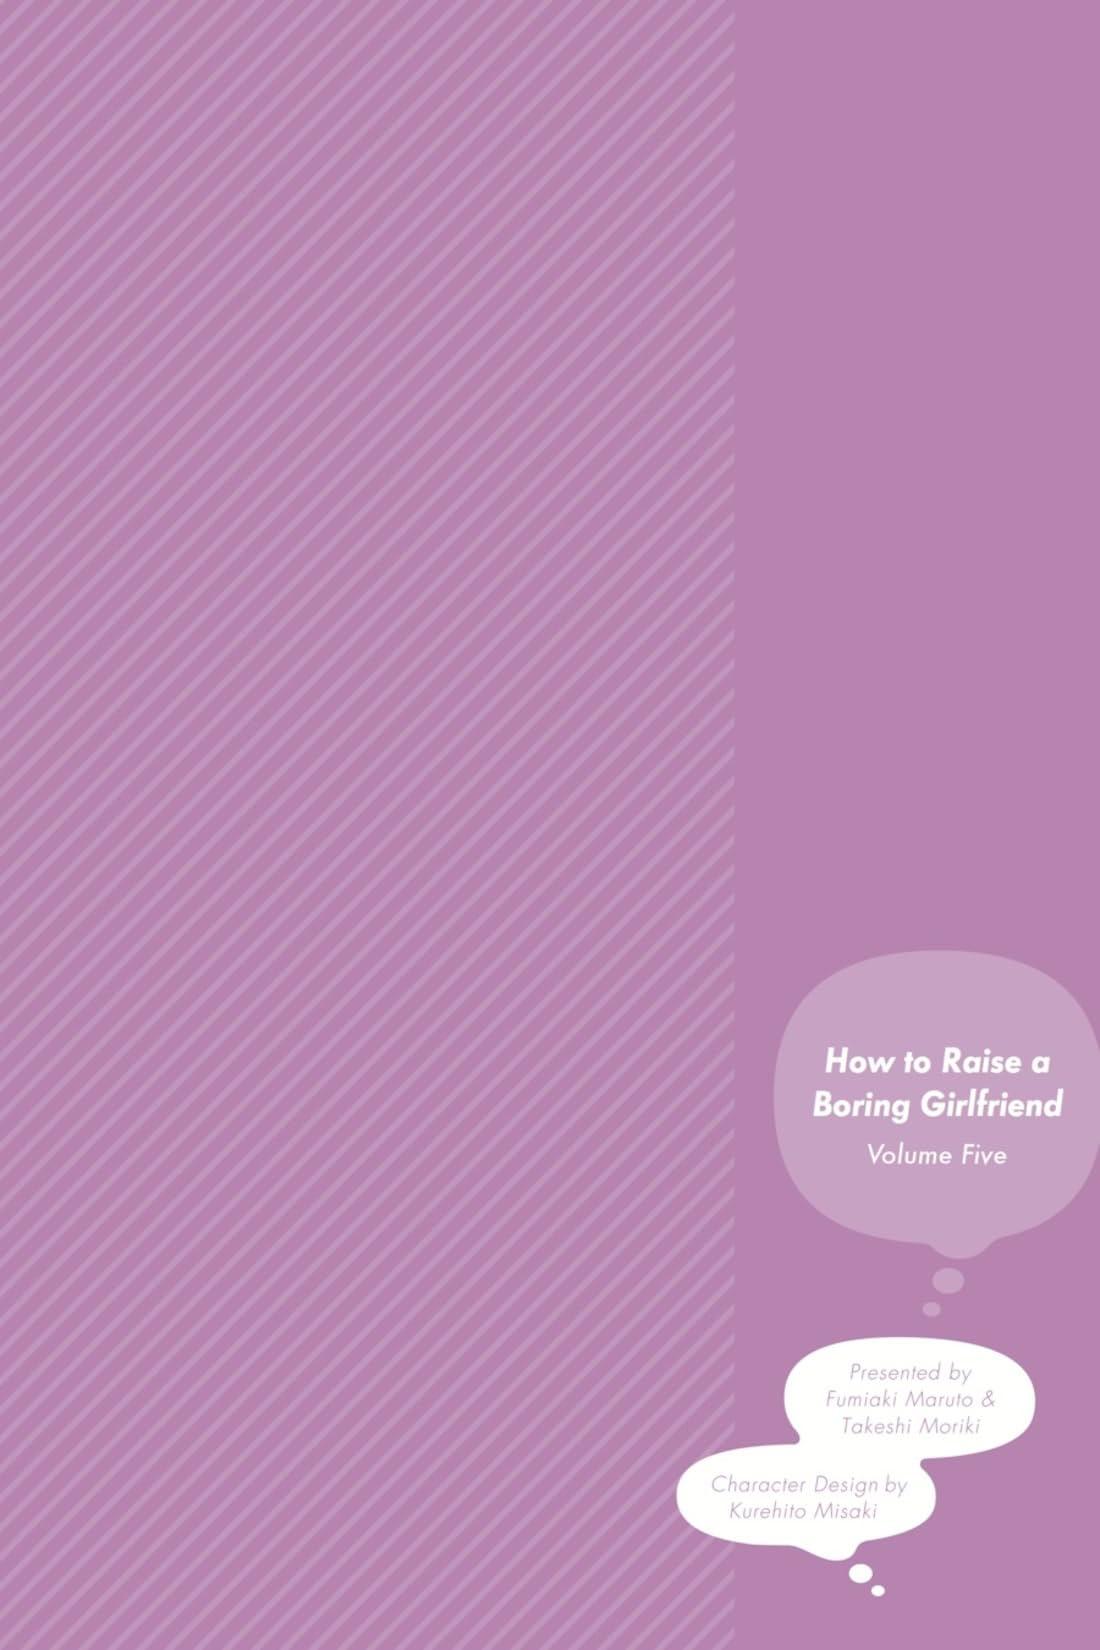 How to Raise a Boring Girlfriend Vol. 5